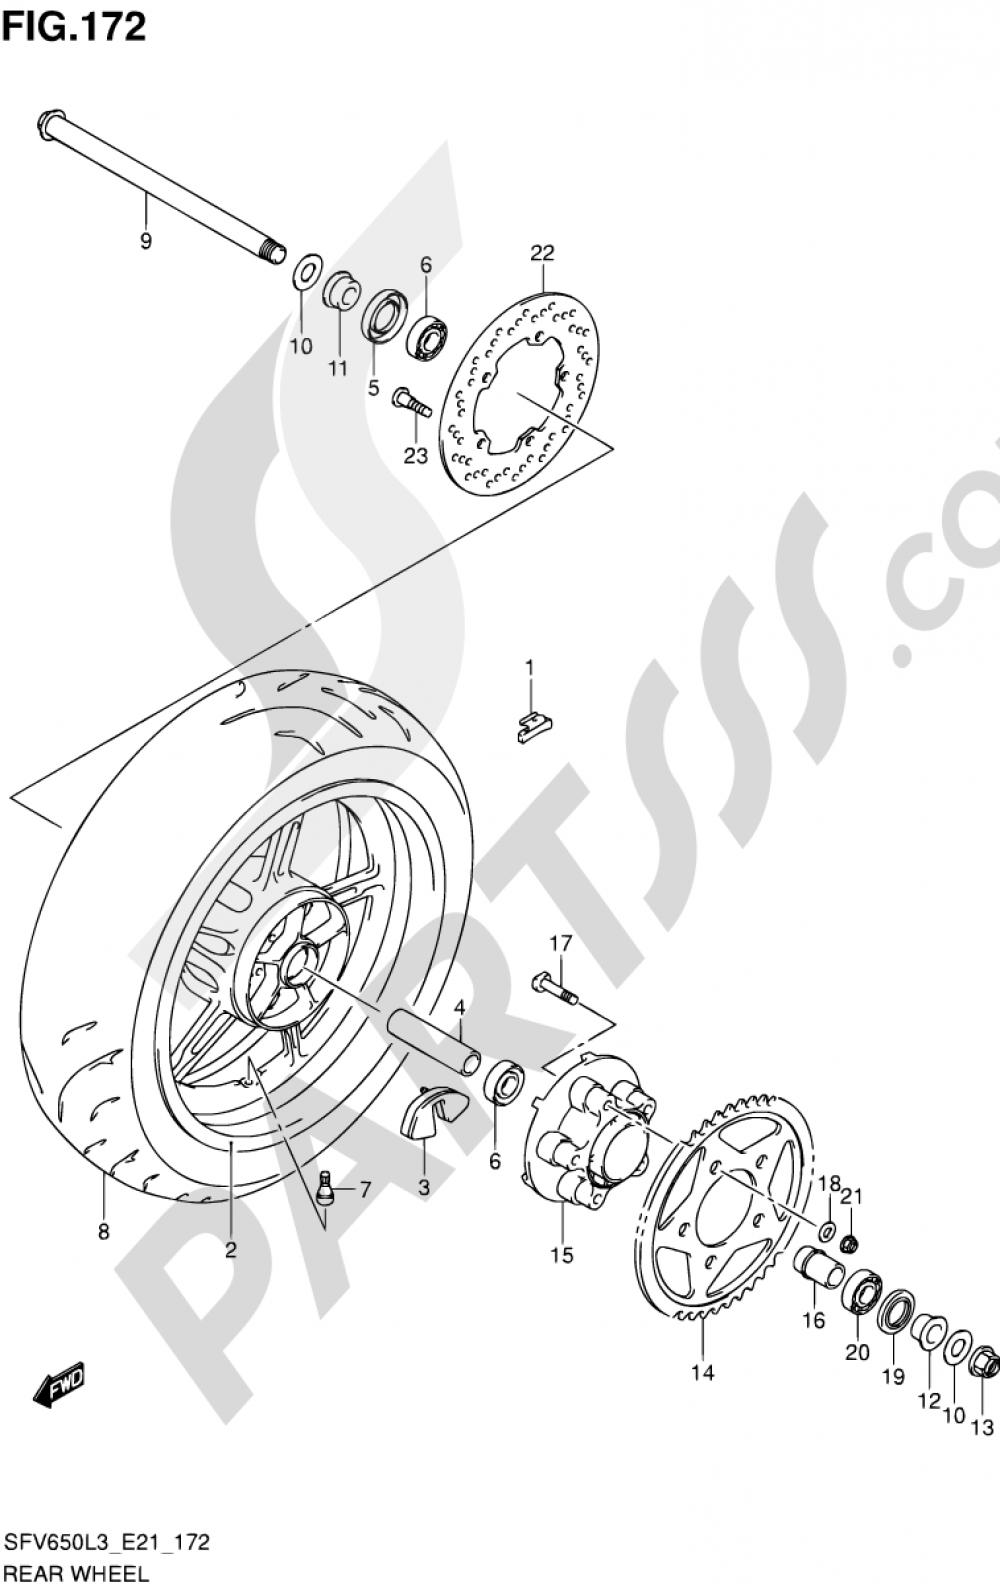 172 - REAR WHEEL (SFV650UL3 E24) Suzuki GLADIUS SFV650A 2013